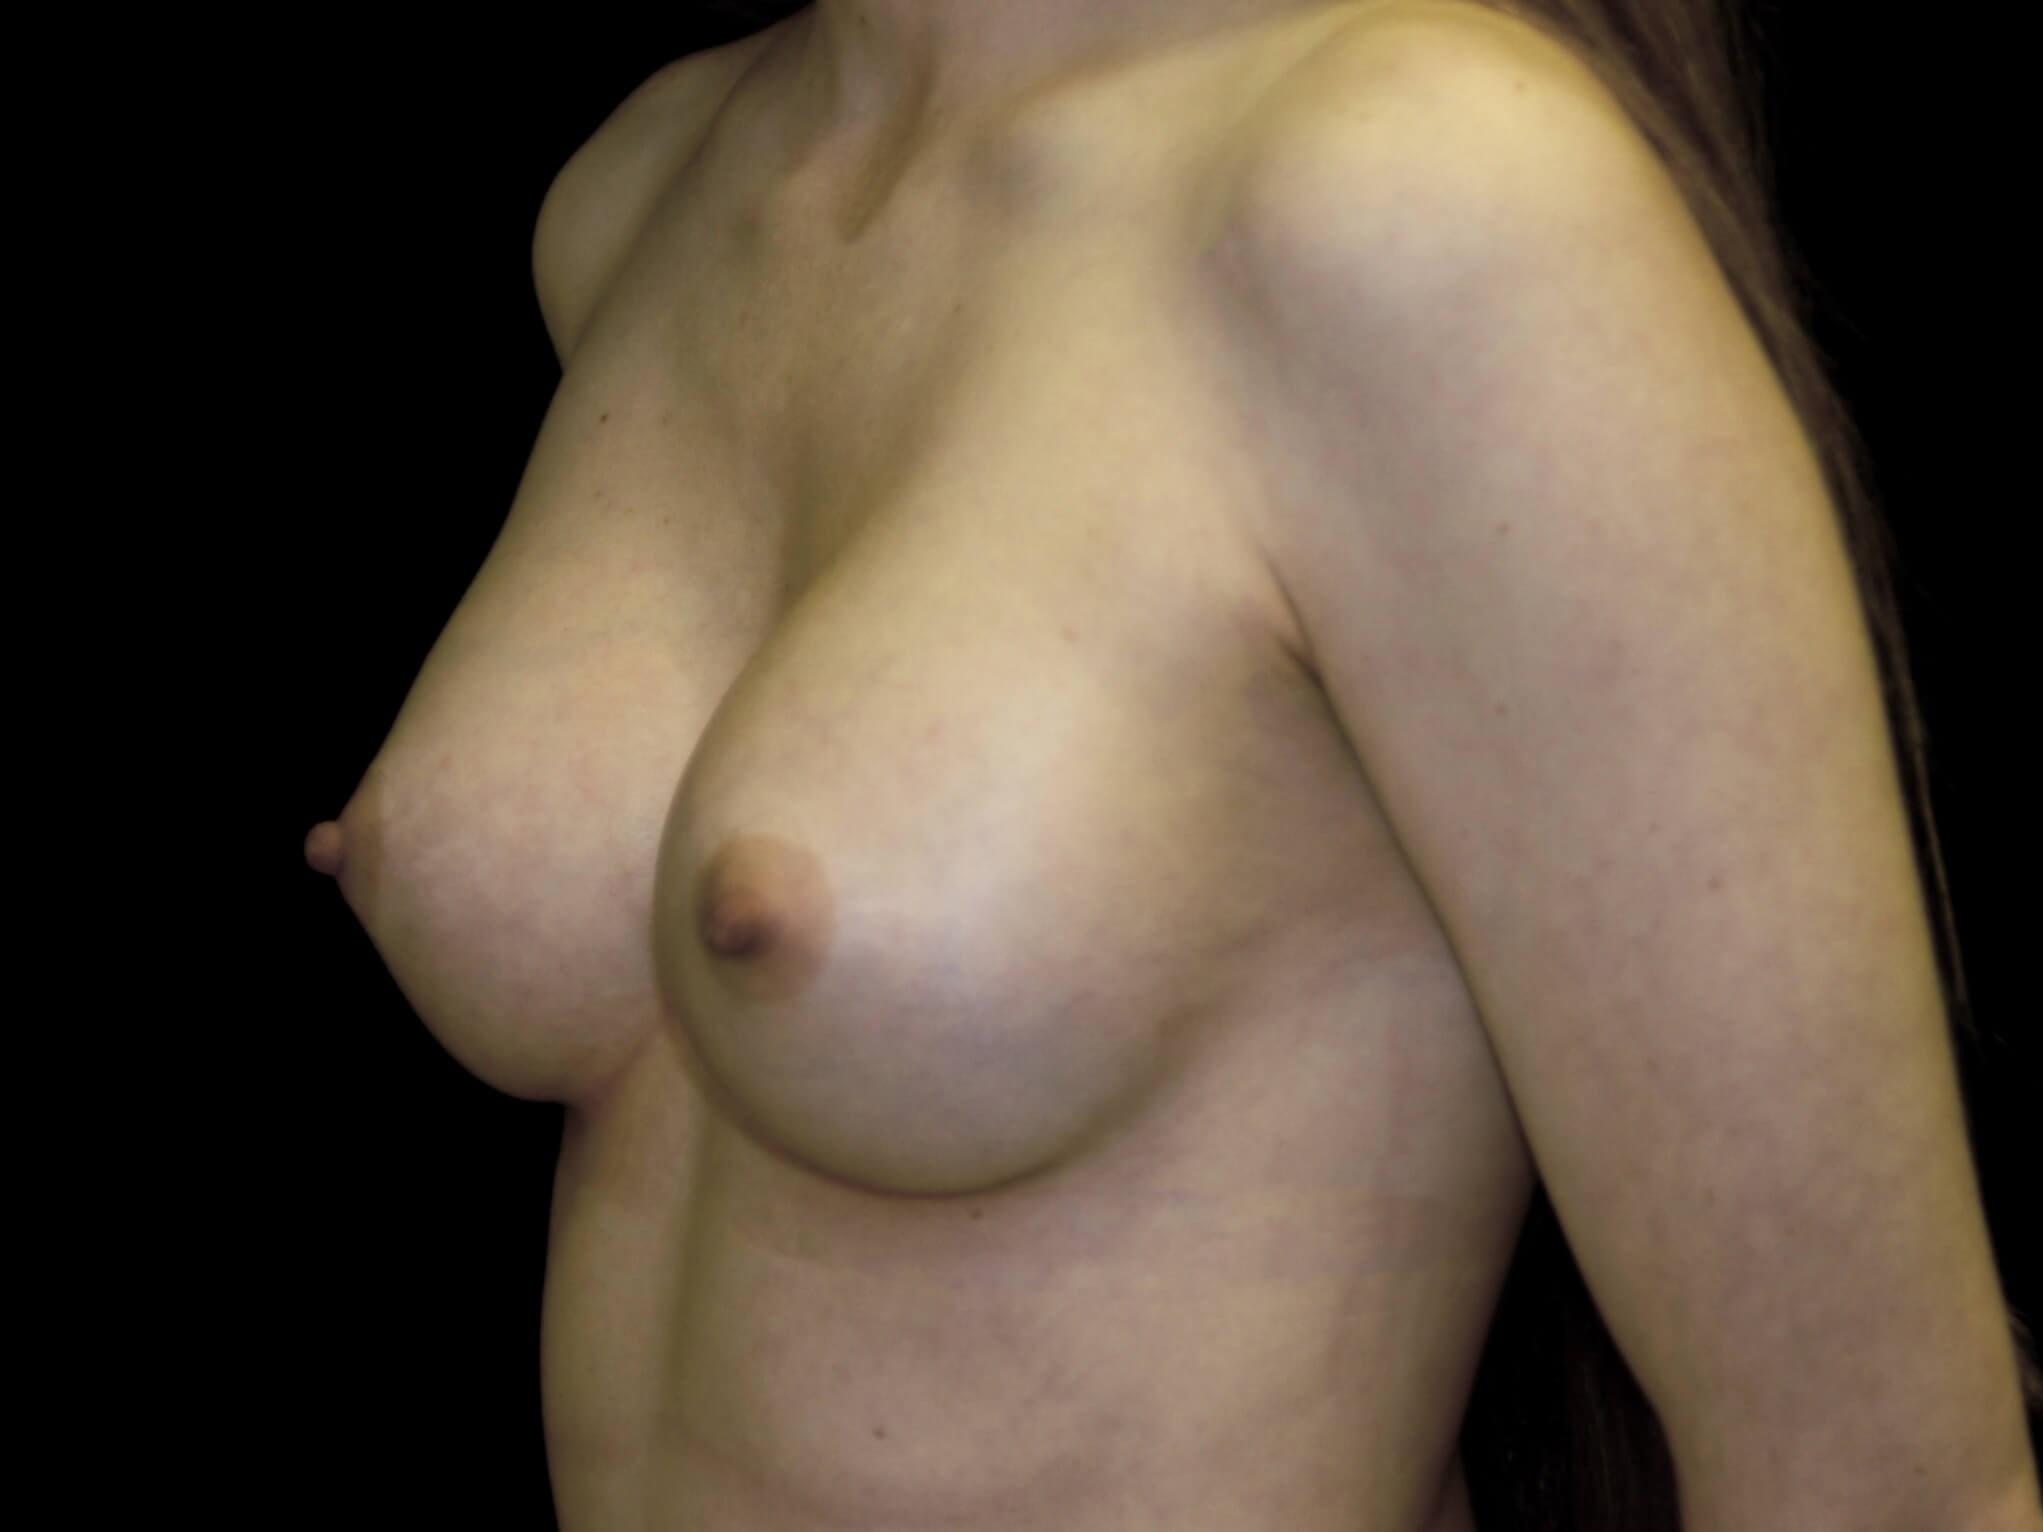 DALLAS, TEXAS WOMAN HAS BREAST AUGMENTATION WITH SILICONE GEL BREAST IMPLANTS